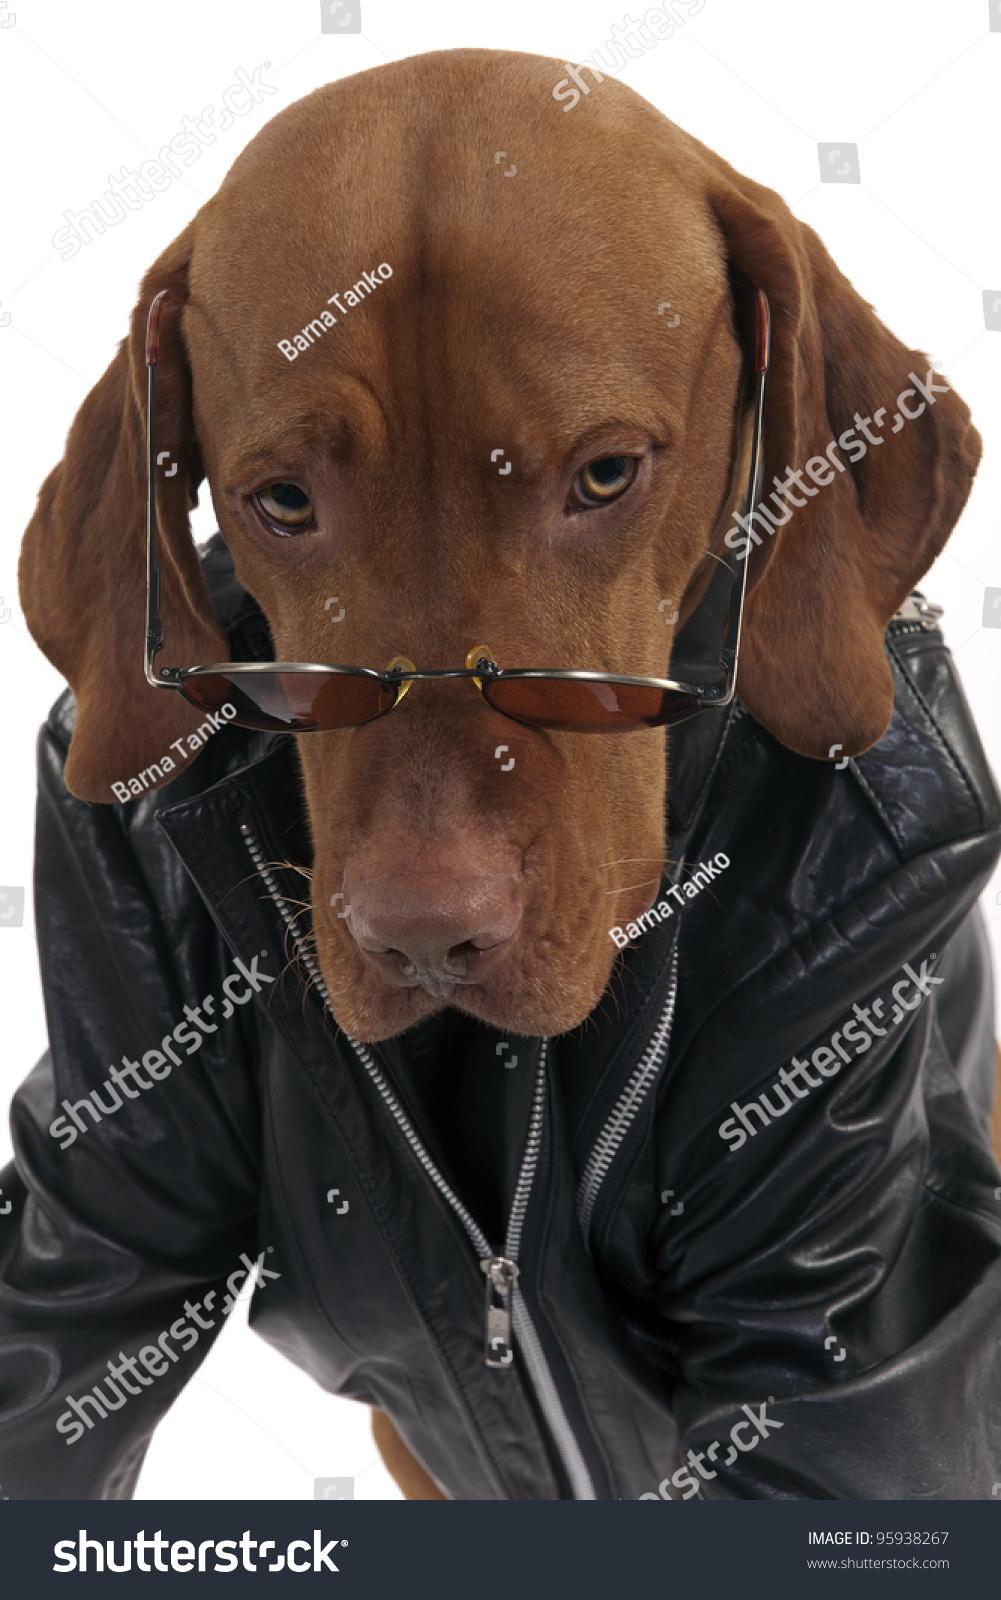 Leather jacket for dogs - Black Brown Leather Dog Coat Jacket Zipper Design Pet Clothes 5